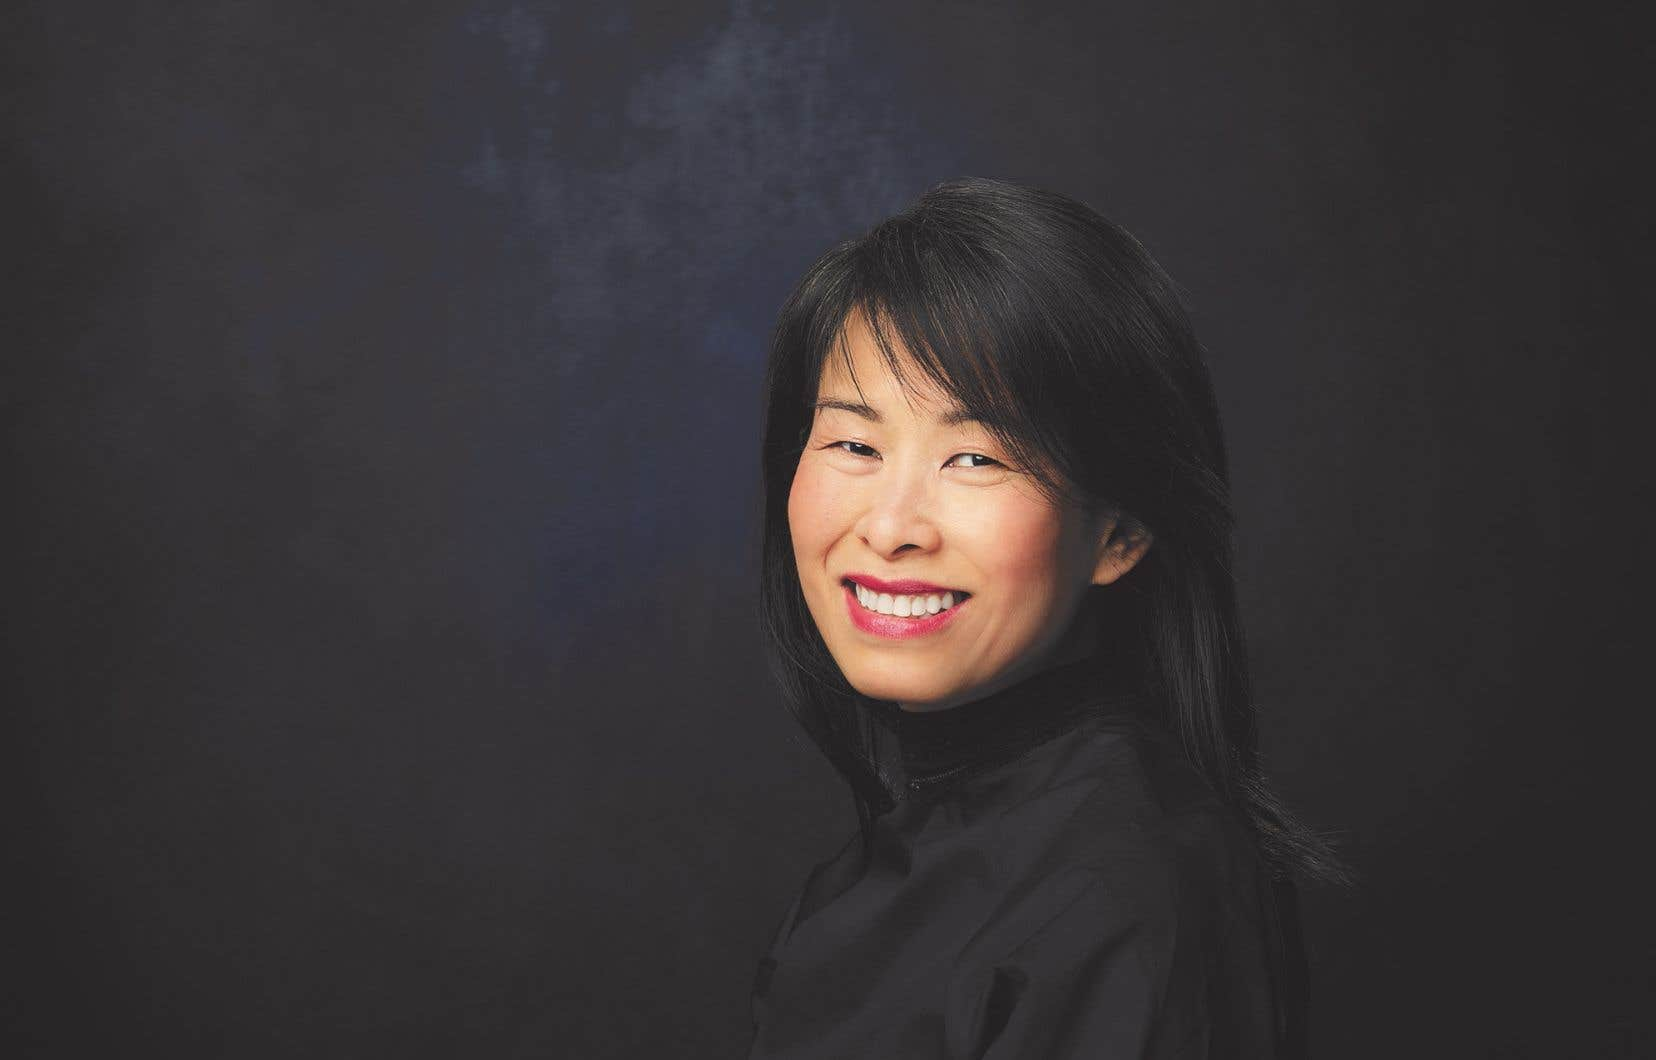 L'autrice Kim Thúy